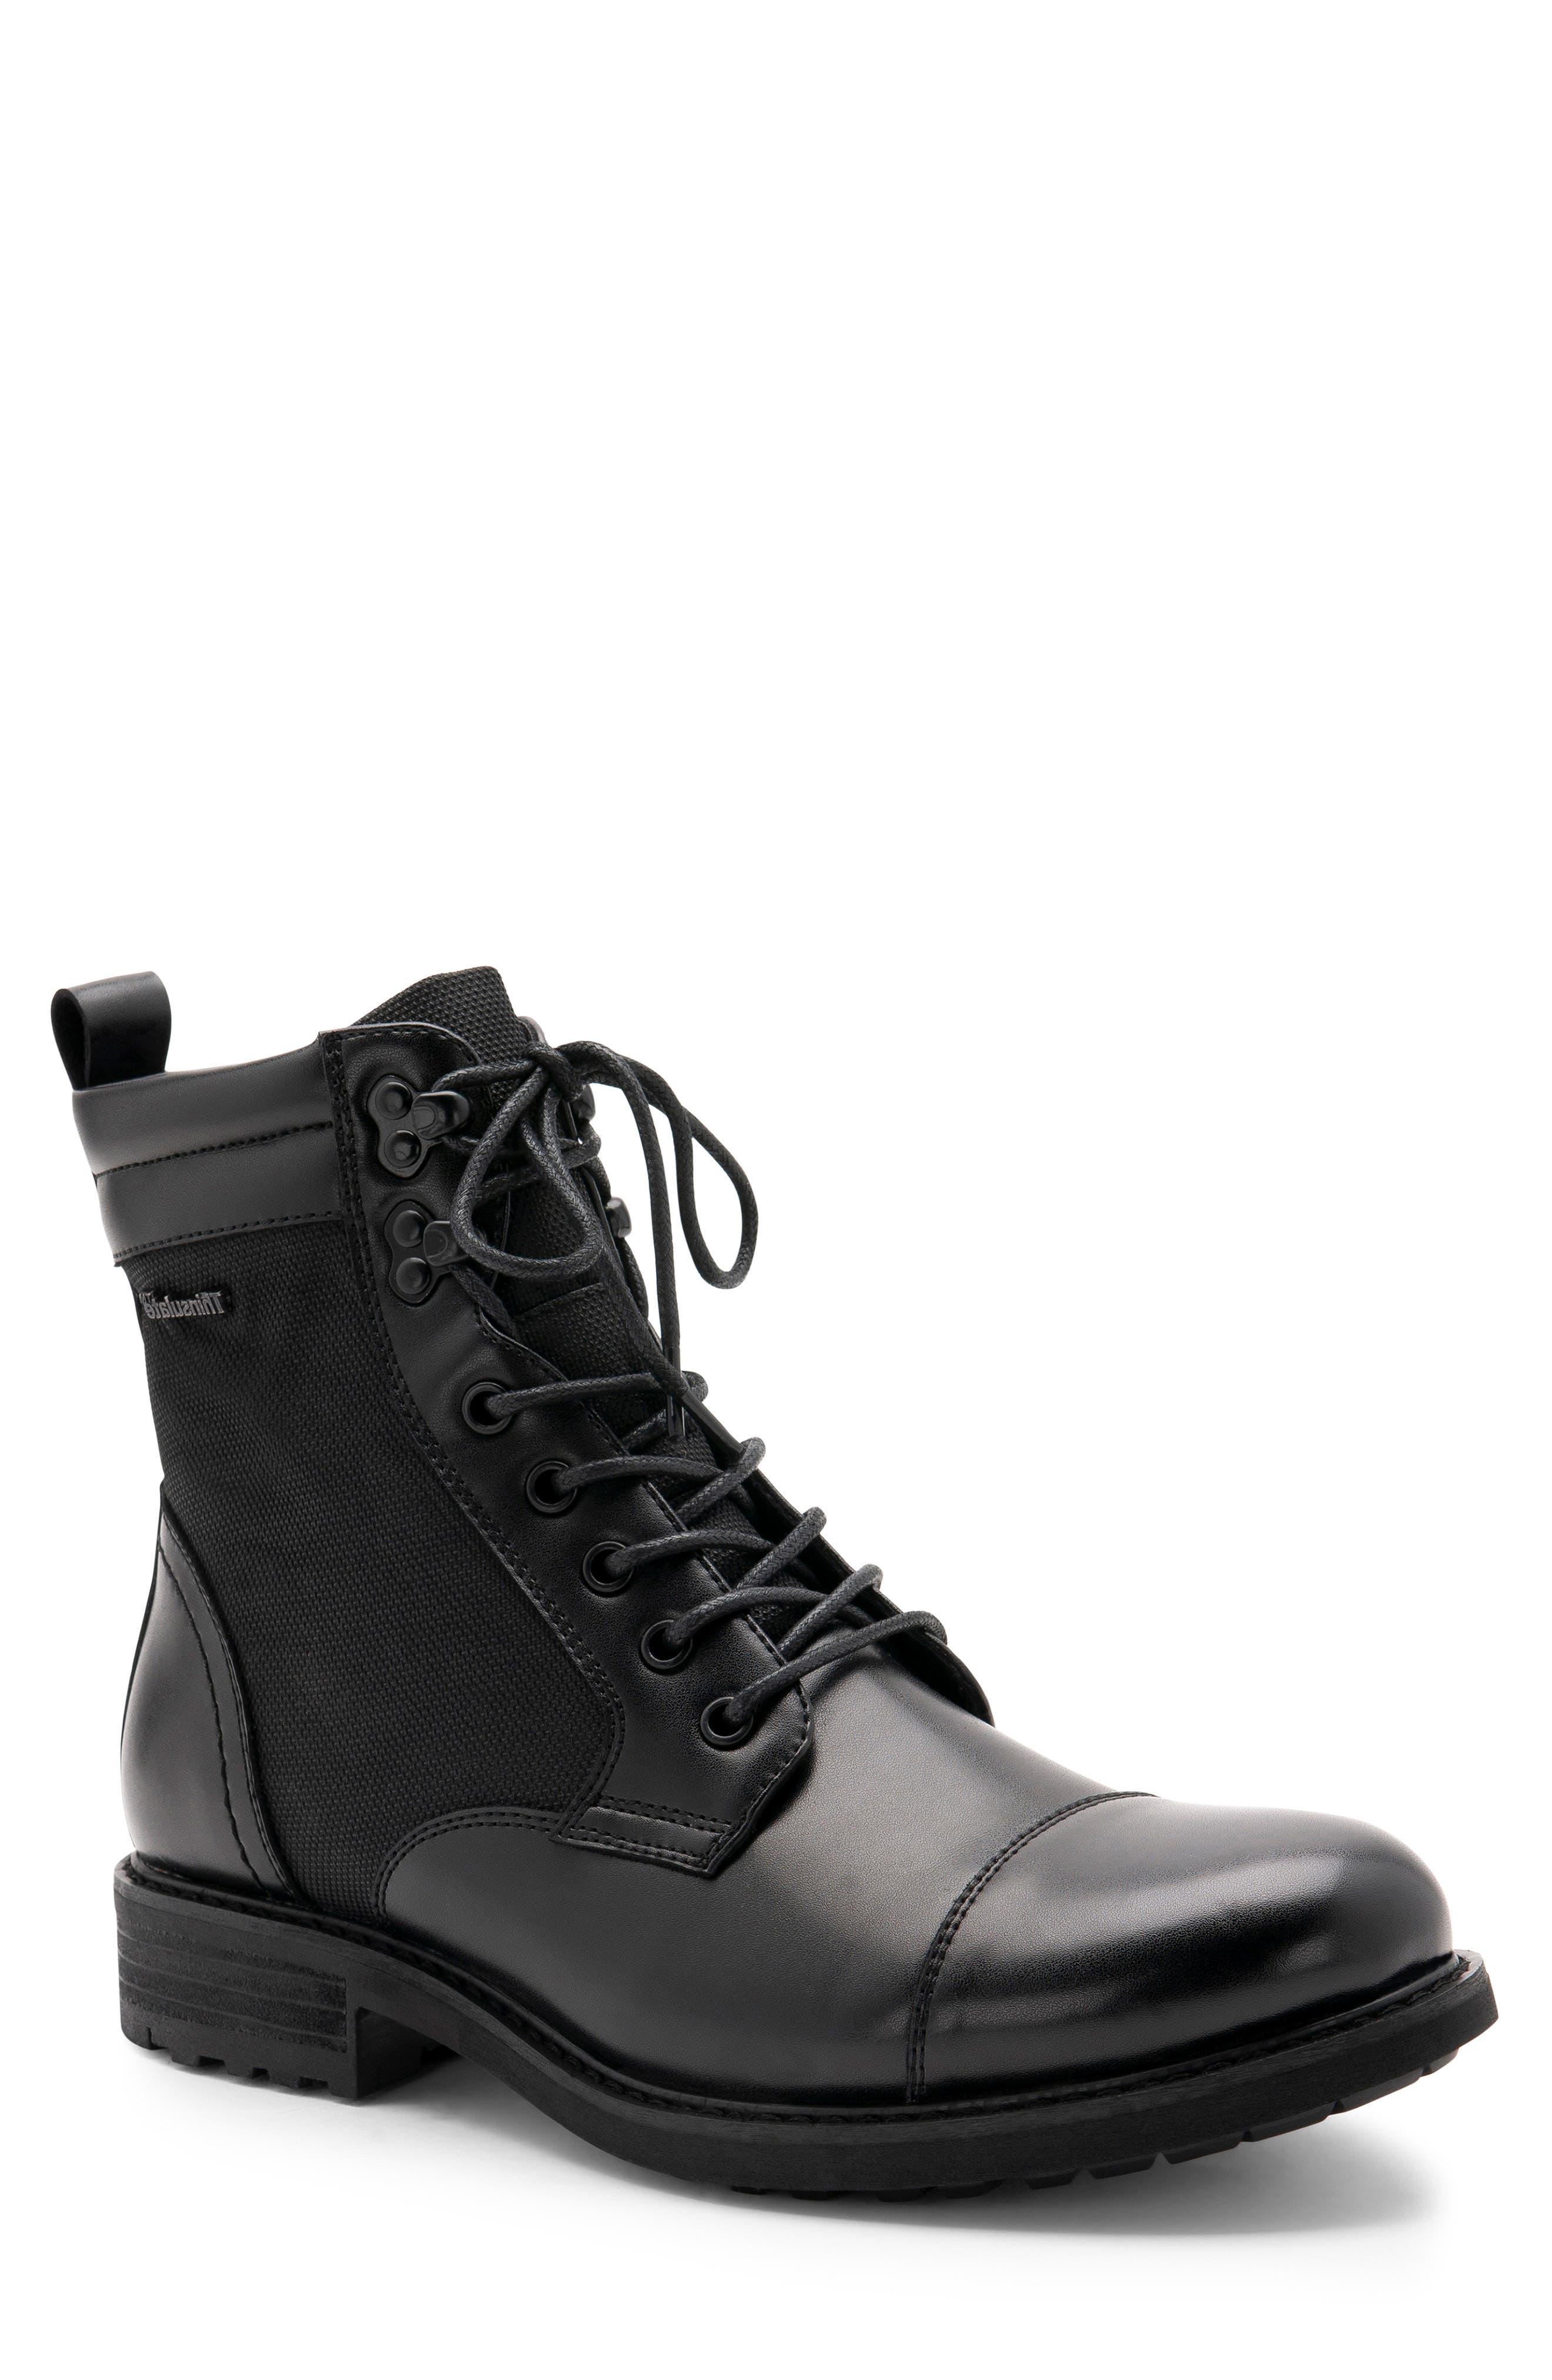 Blondo Paxton Waterproof Cap Toe Boot- Black